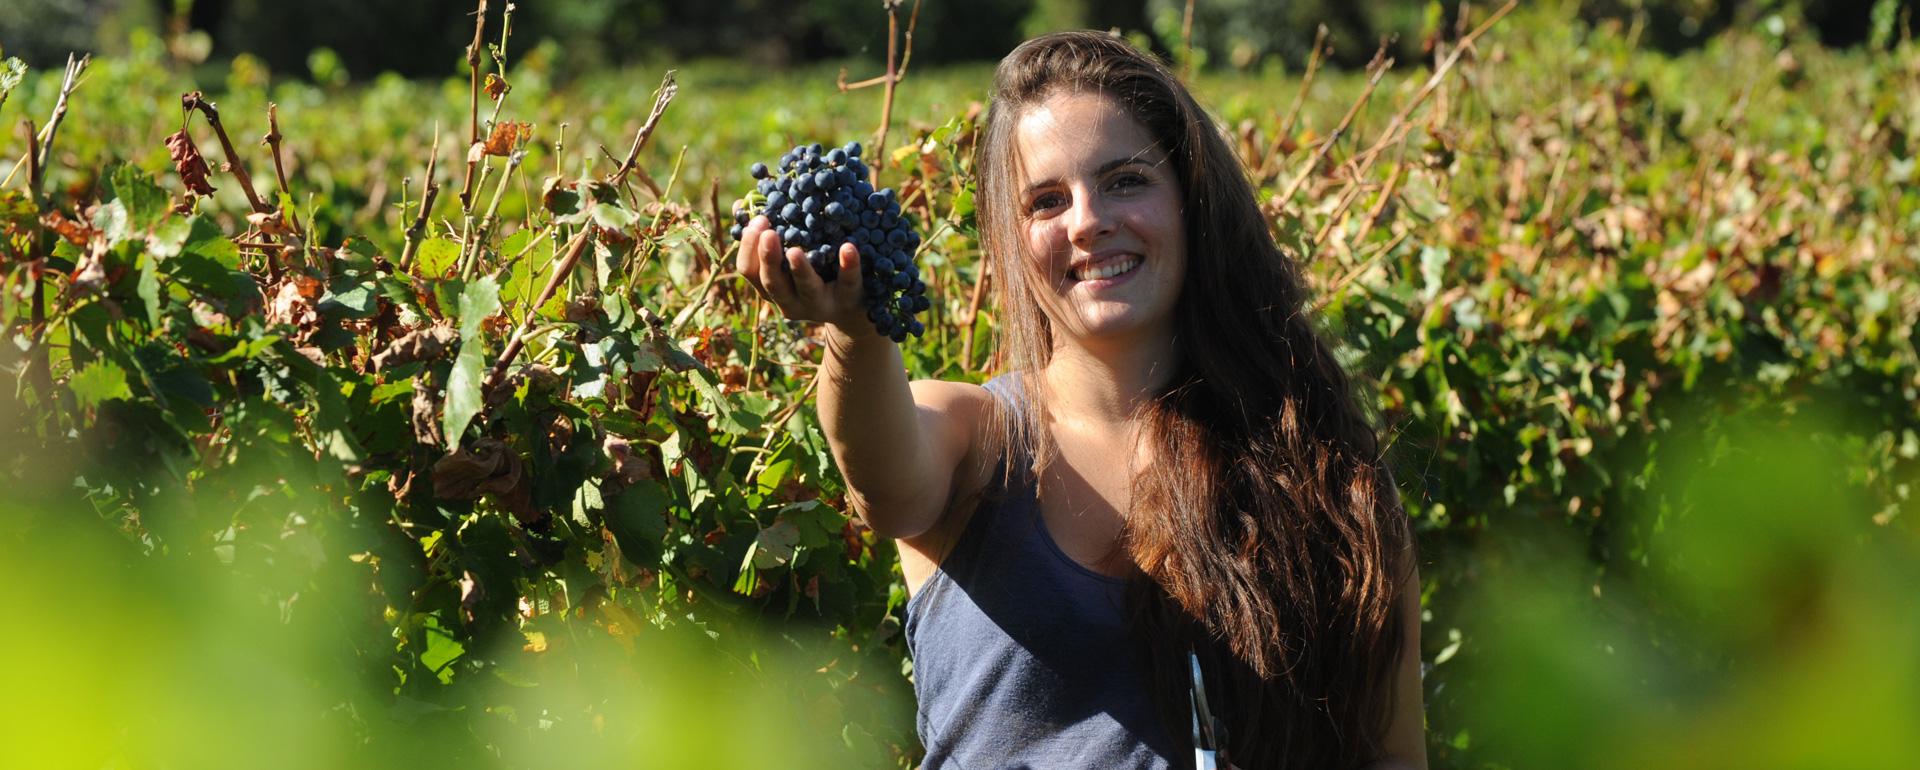 Vignobles de la vallée du Rhône - Gard